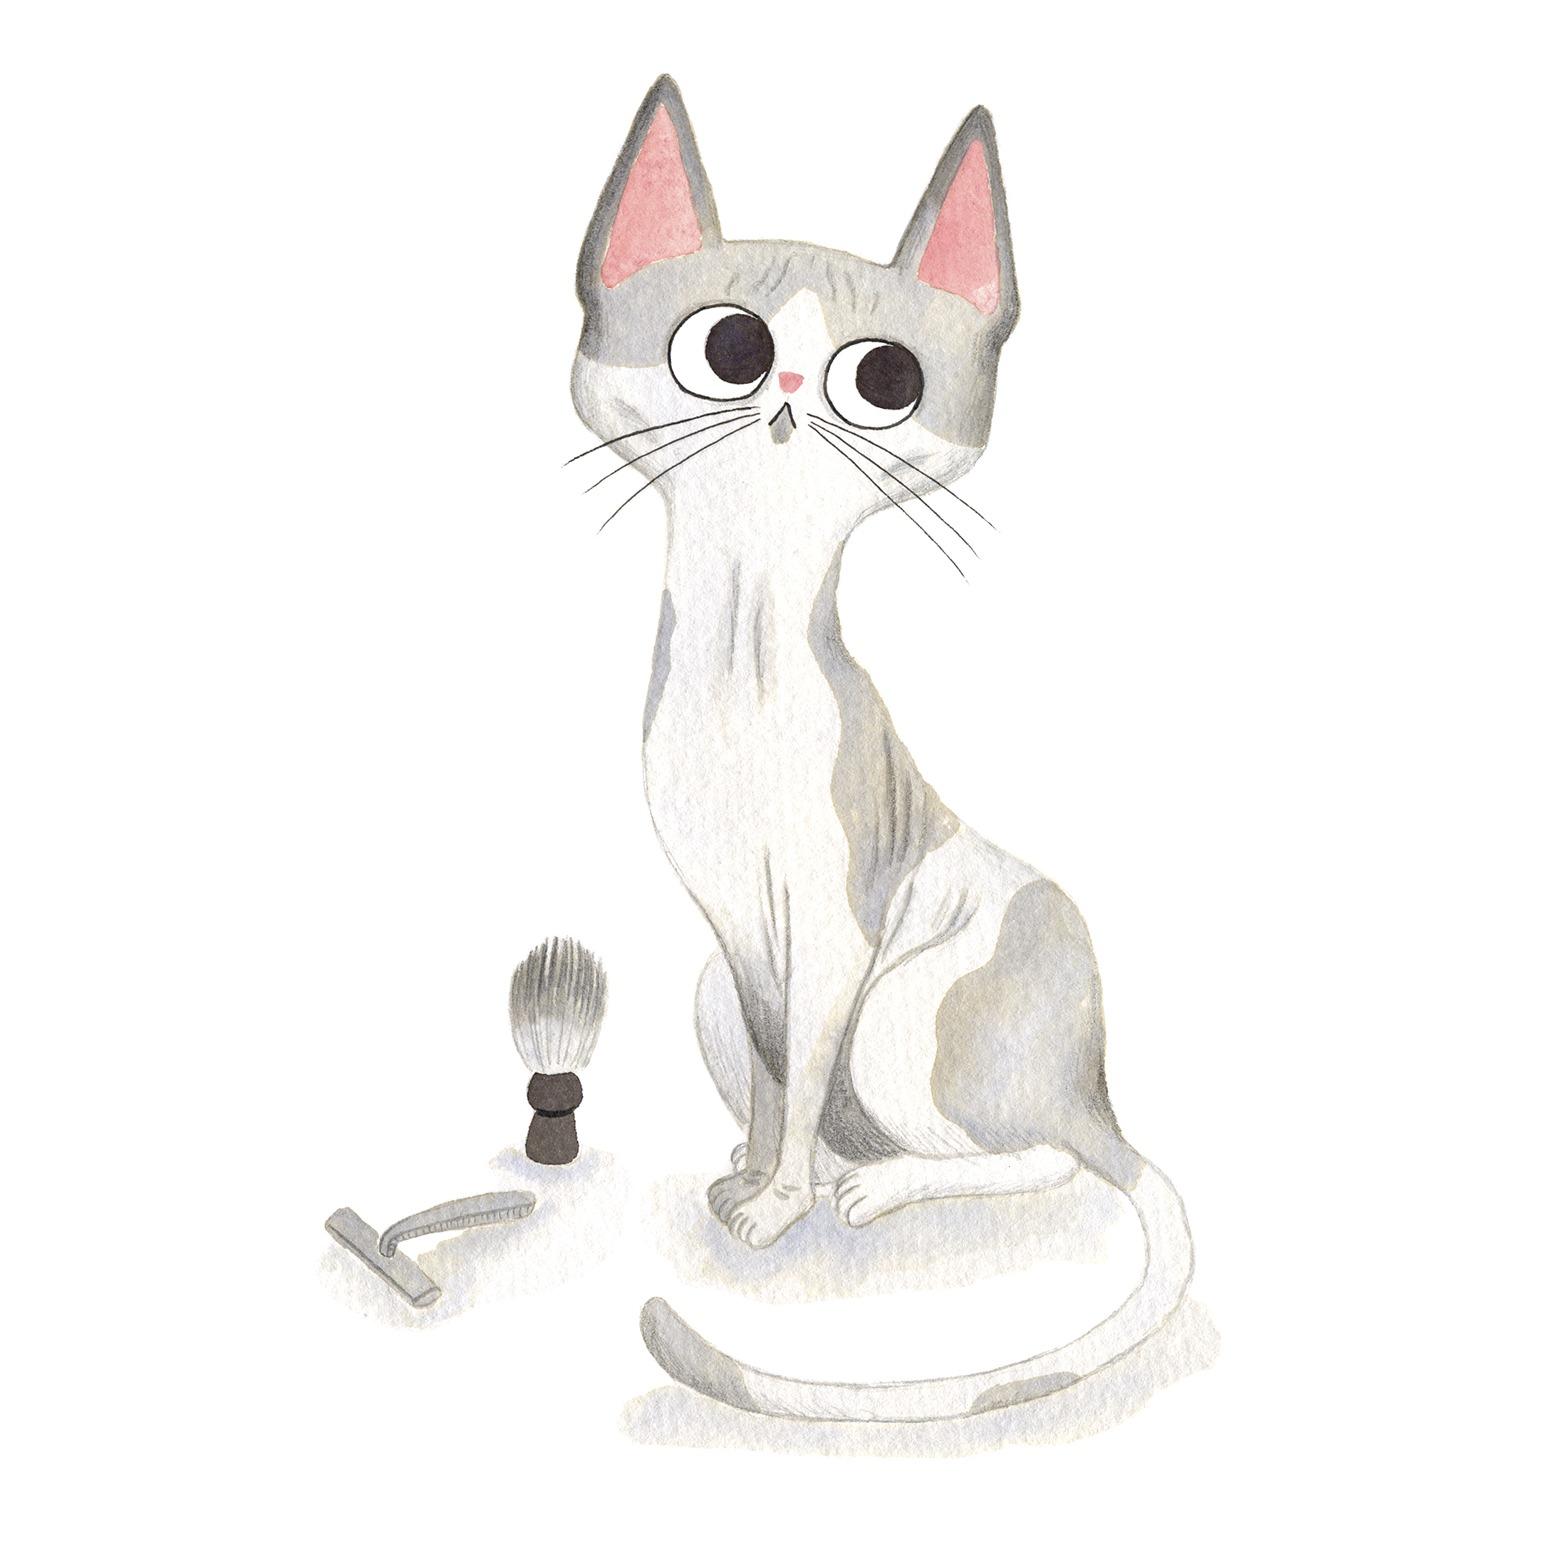 Ilustración de gato, Inktober, gato sin pelo, gato esfinge, sphinx cat, retrato de gato